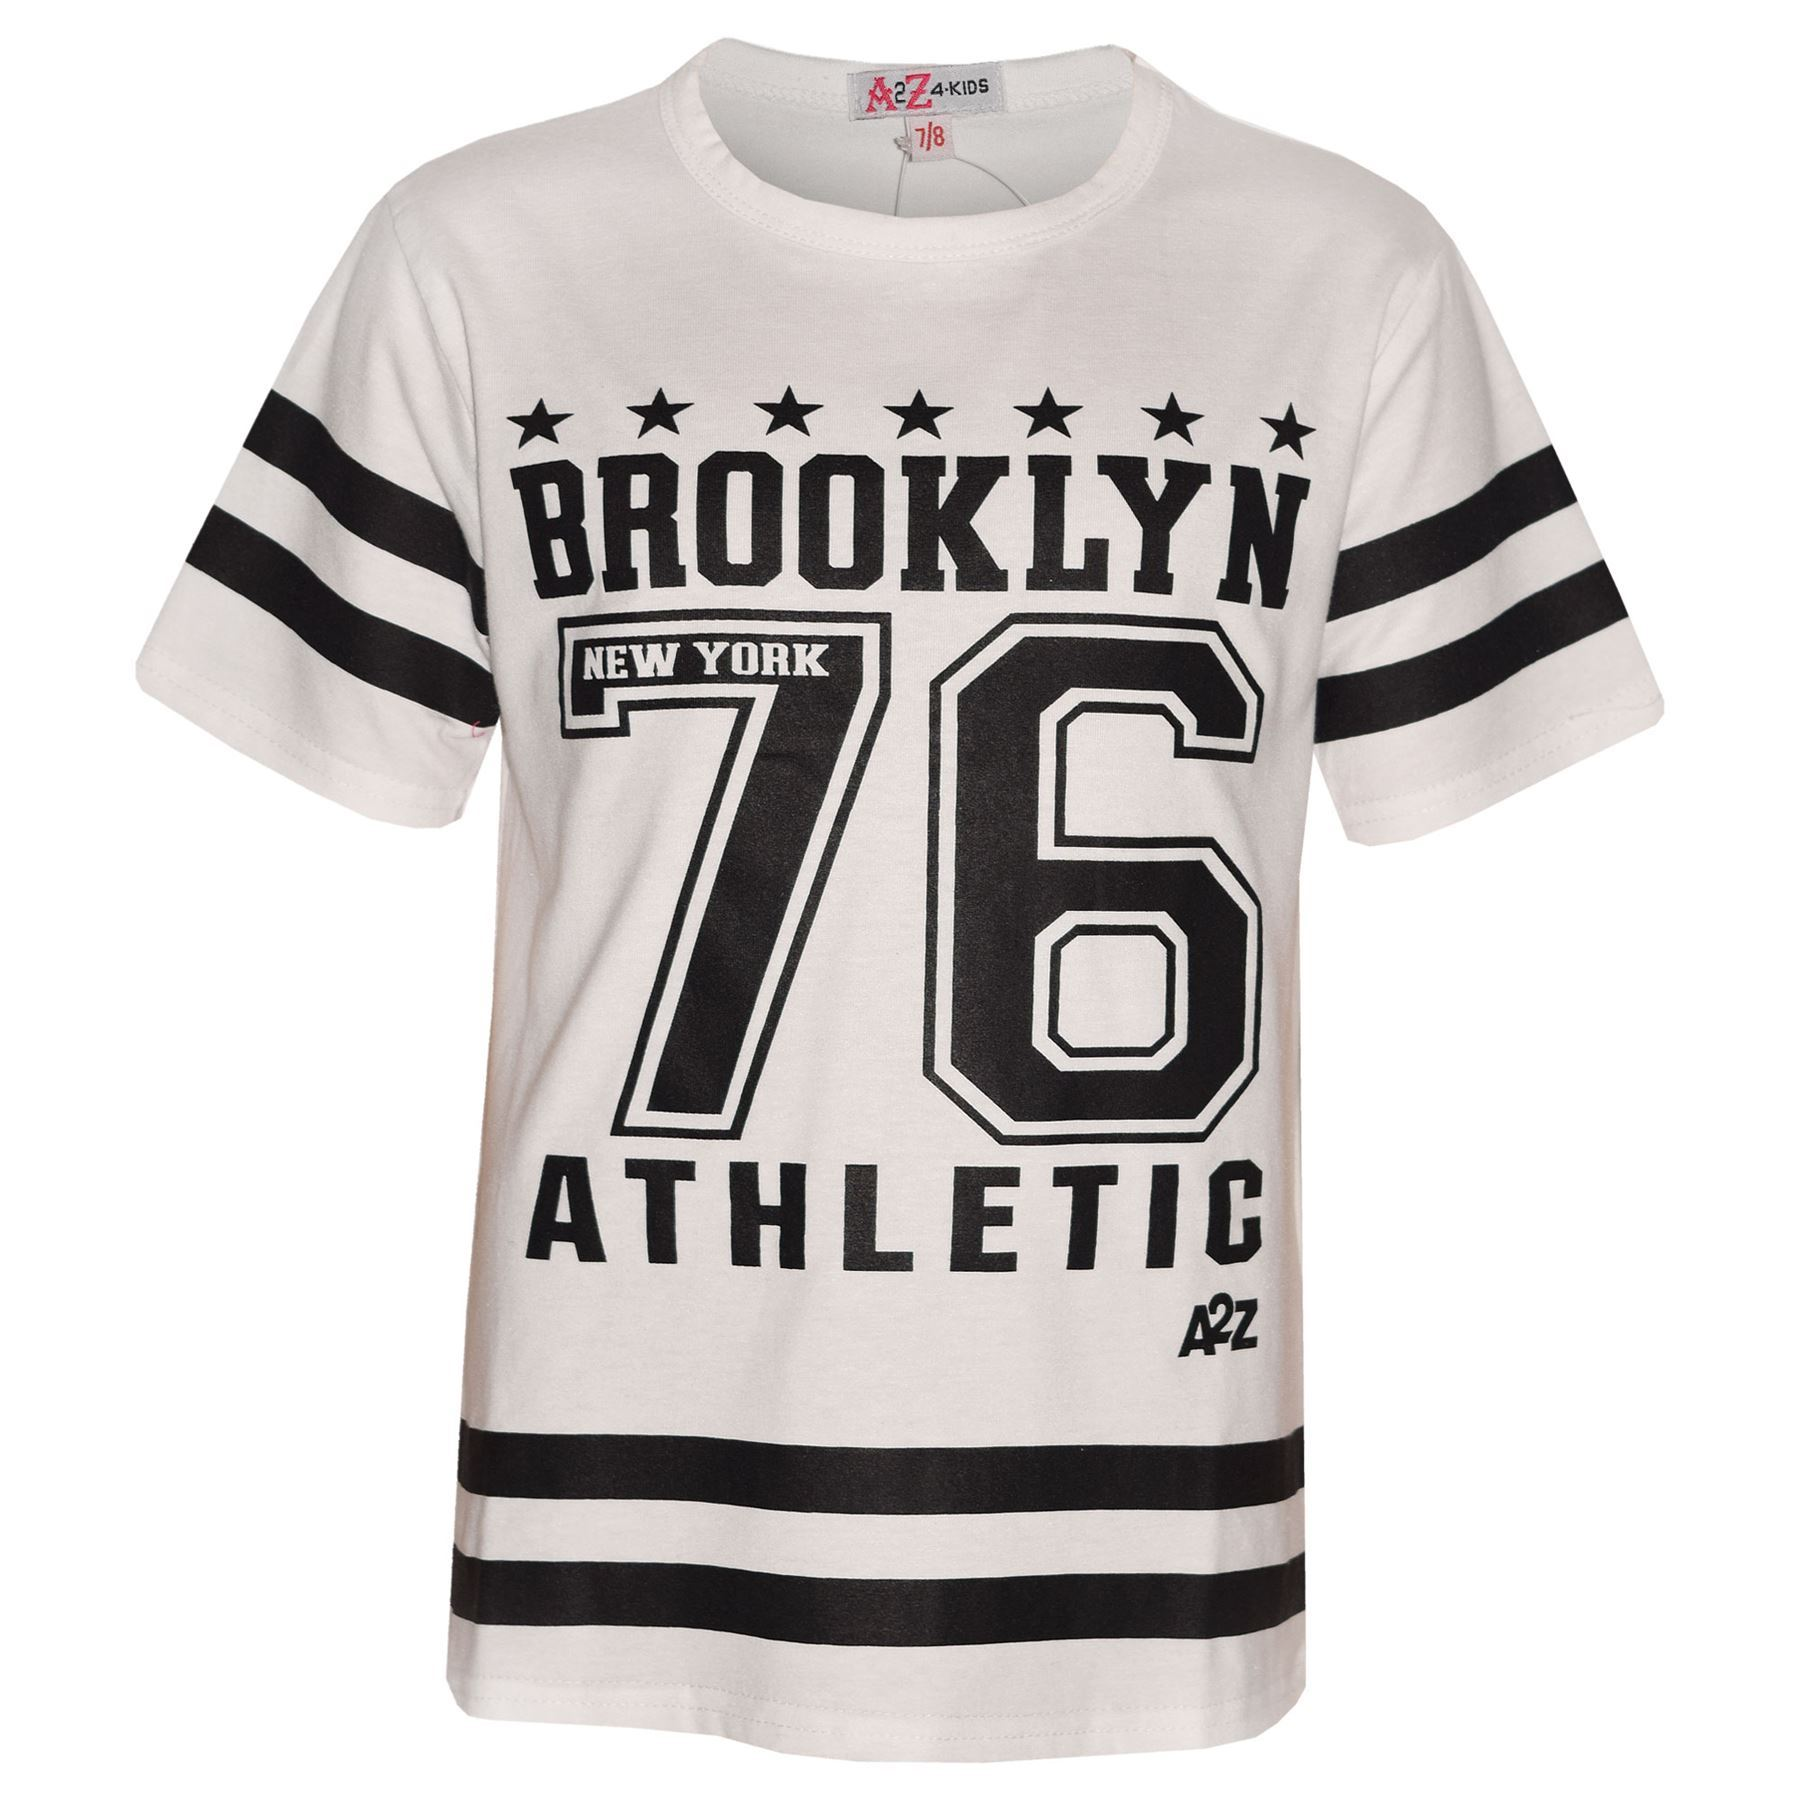 3174d6aff2 Girls Top Kids Designer's Brooklyn 76 Athletic T Shirt Top & Legging ...